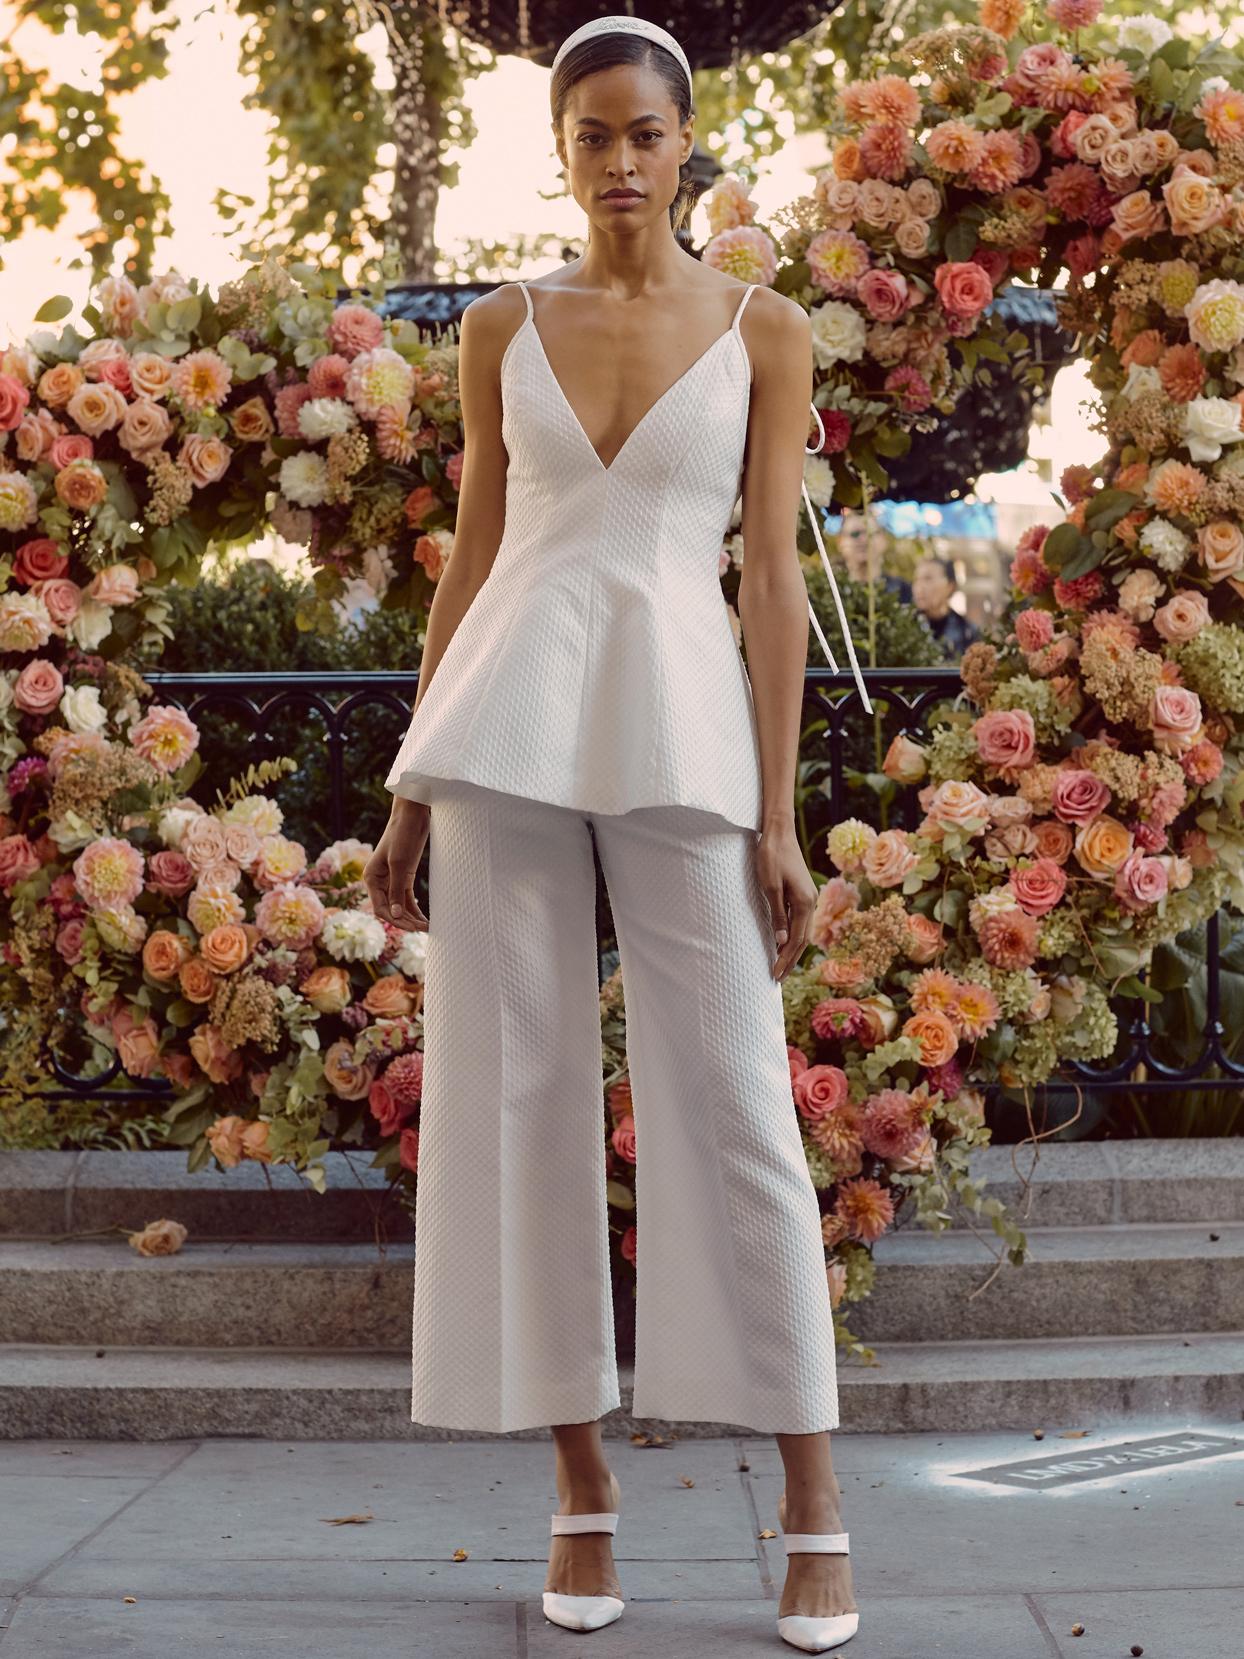 lela rose spaghetti strap v-neck top and capris wedding dress fall 2020